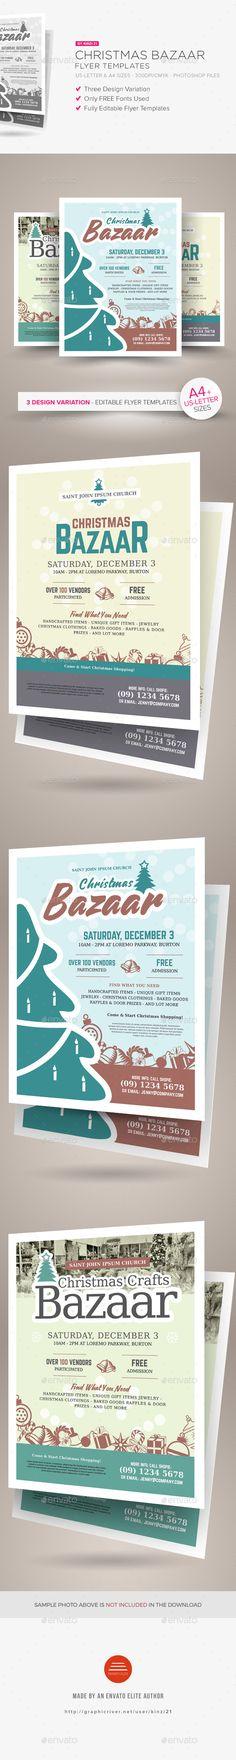 Christmas Bazaar Flyer Templates by kinzi21 Christmas Bazaar Flyer Templates A flyer template pack perfect for promoting a Christmas bazaar, market, craft fair, etc. Availabl